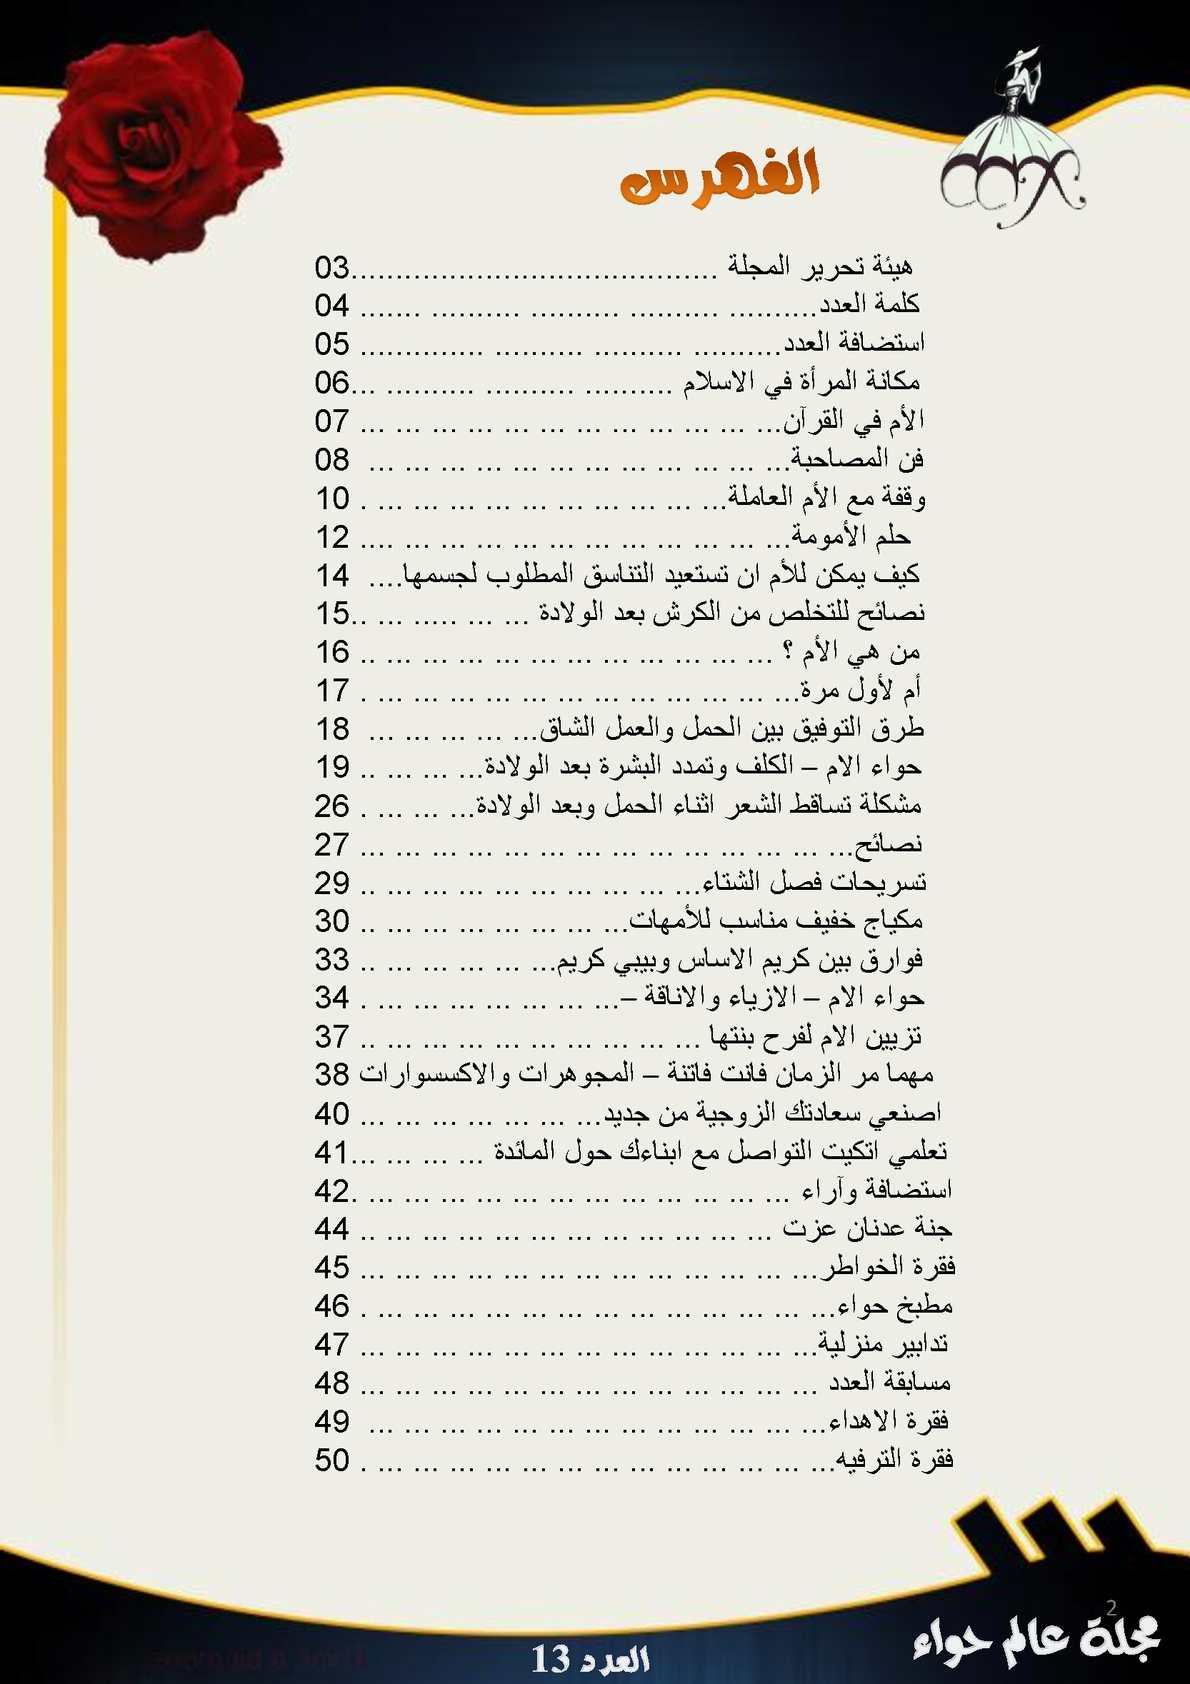 2b24e5cc2 MAGAZINE HAWA muslim 13 -02 - CALAMEO Downloader